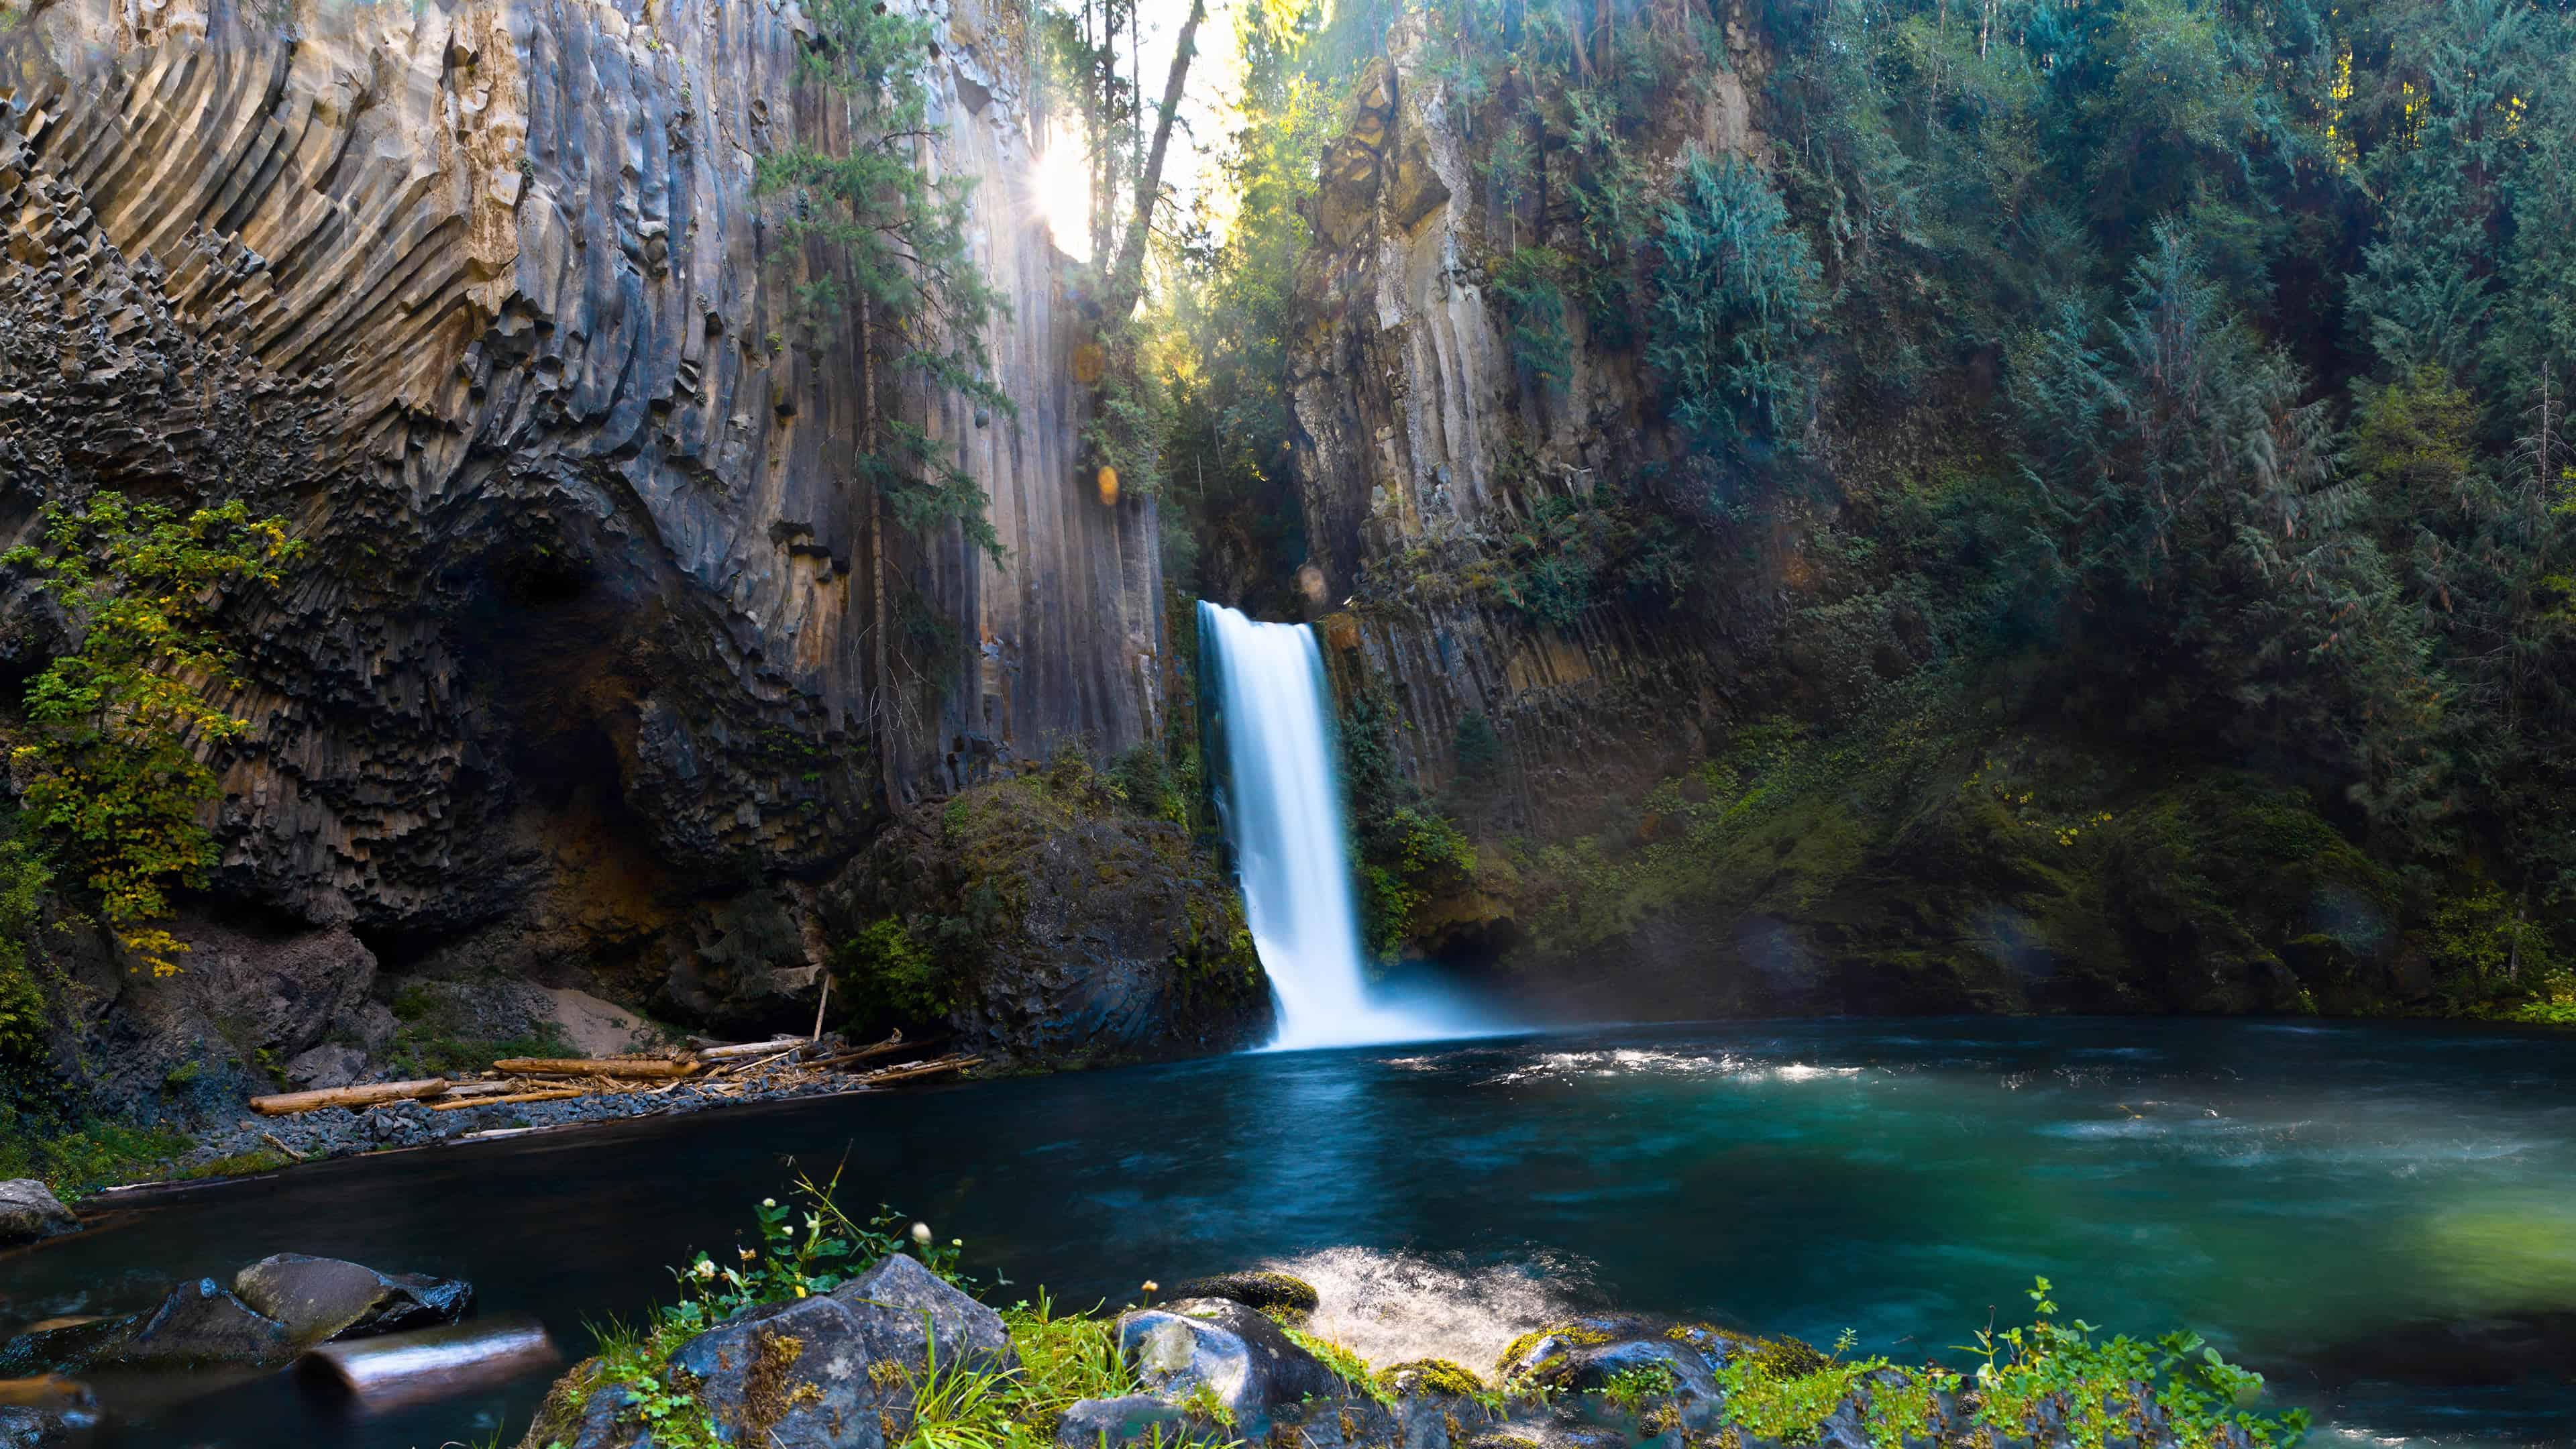 toketee falls north umpqua river oregon united states uhd 4k wallpaper